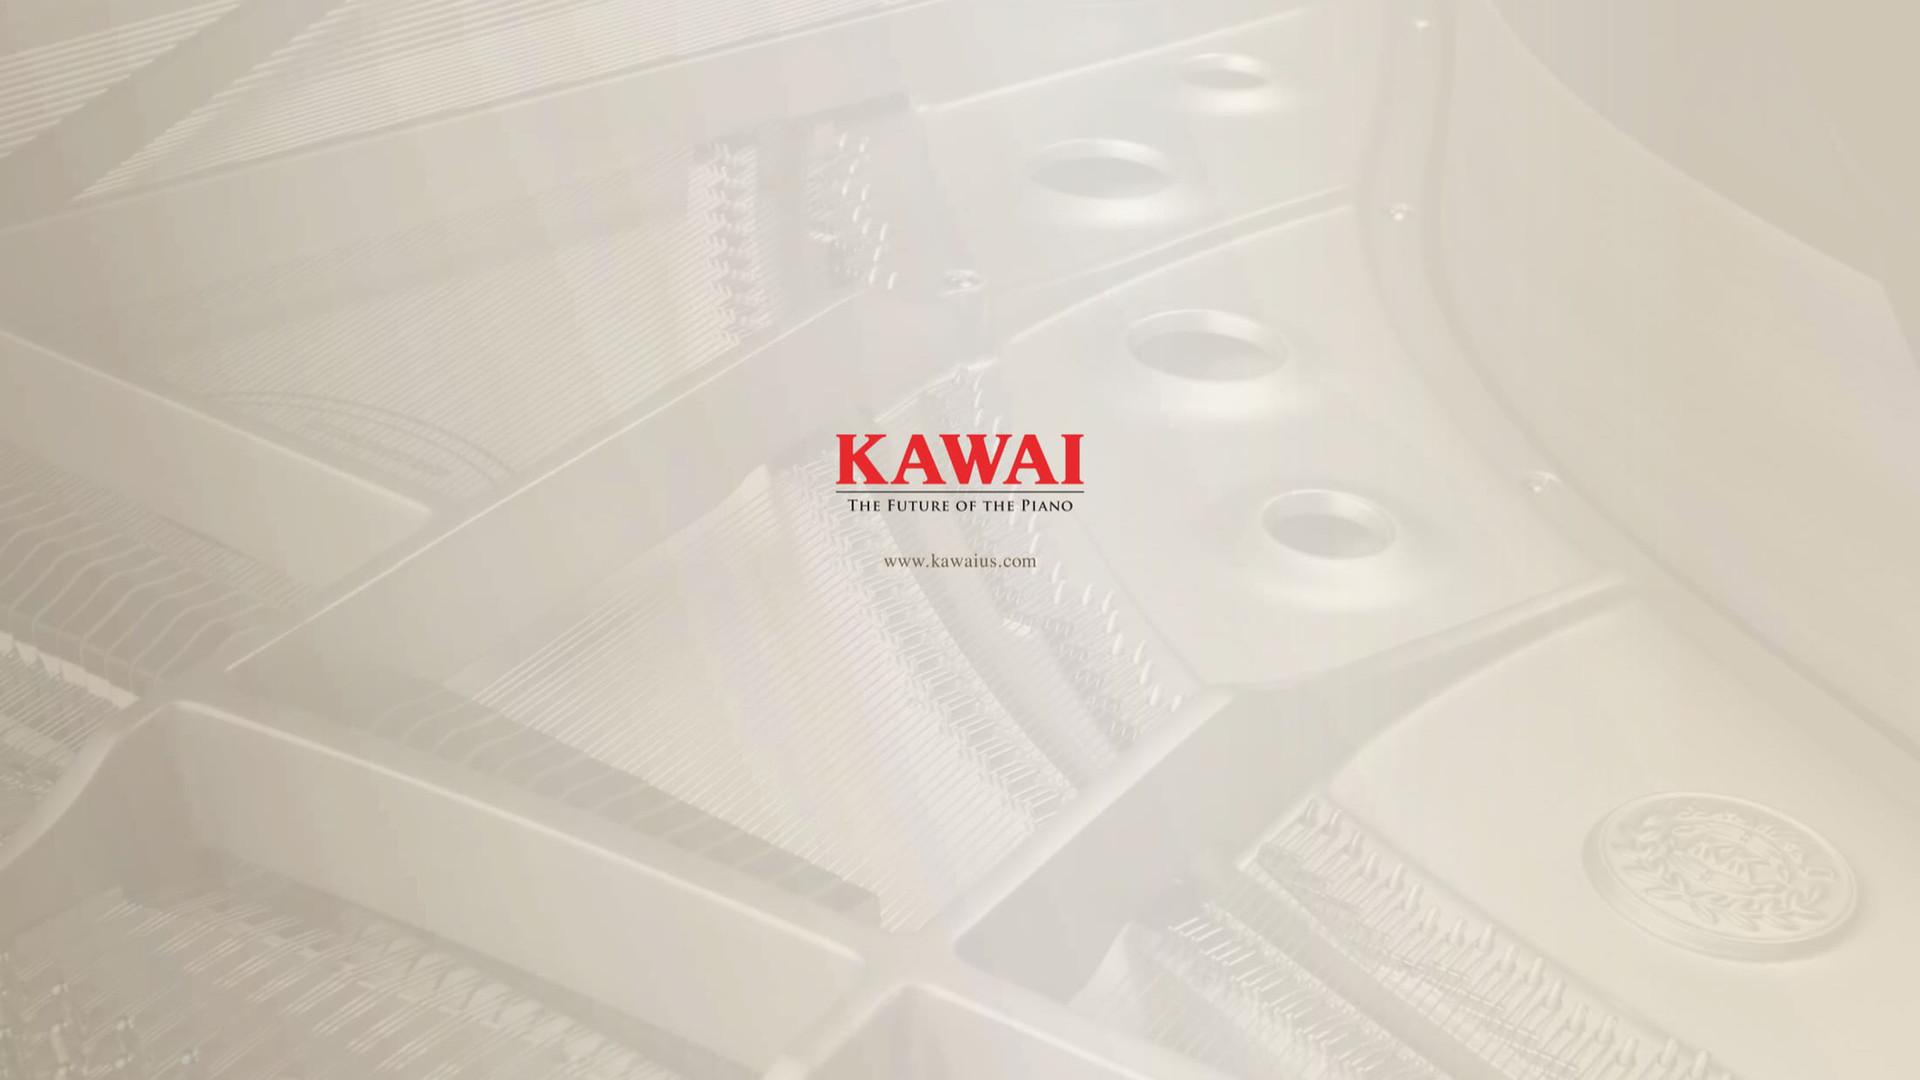 Kawai-GL-Brochure-22.jpg